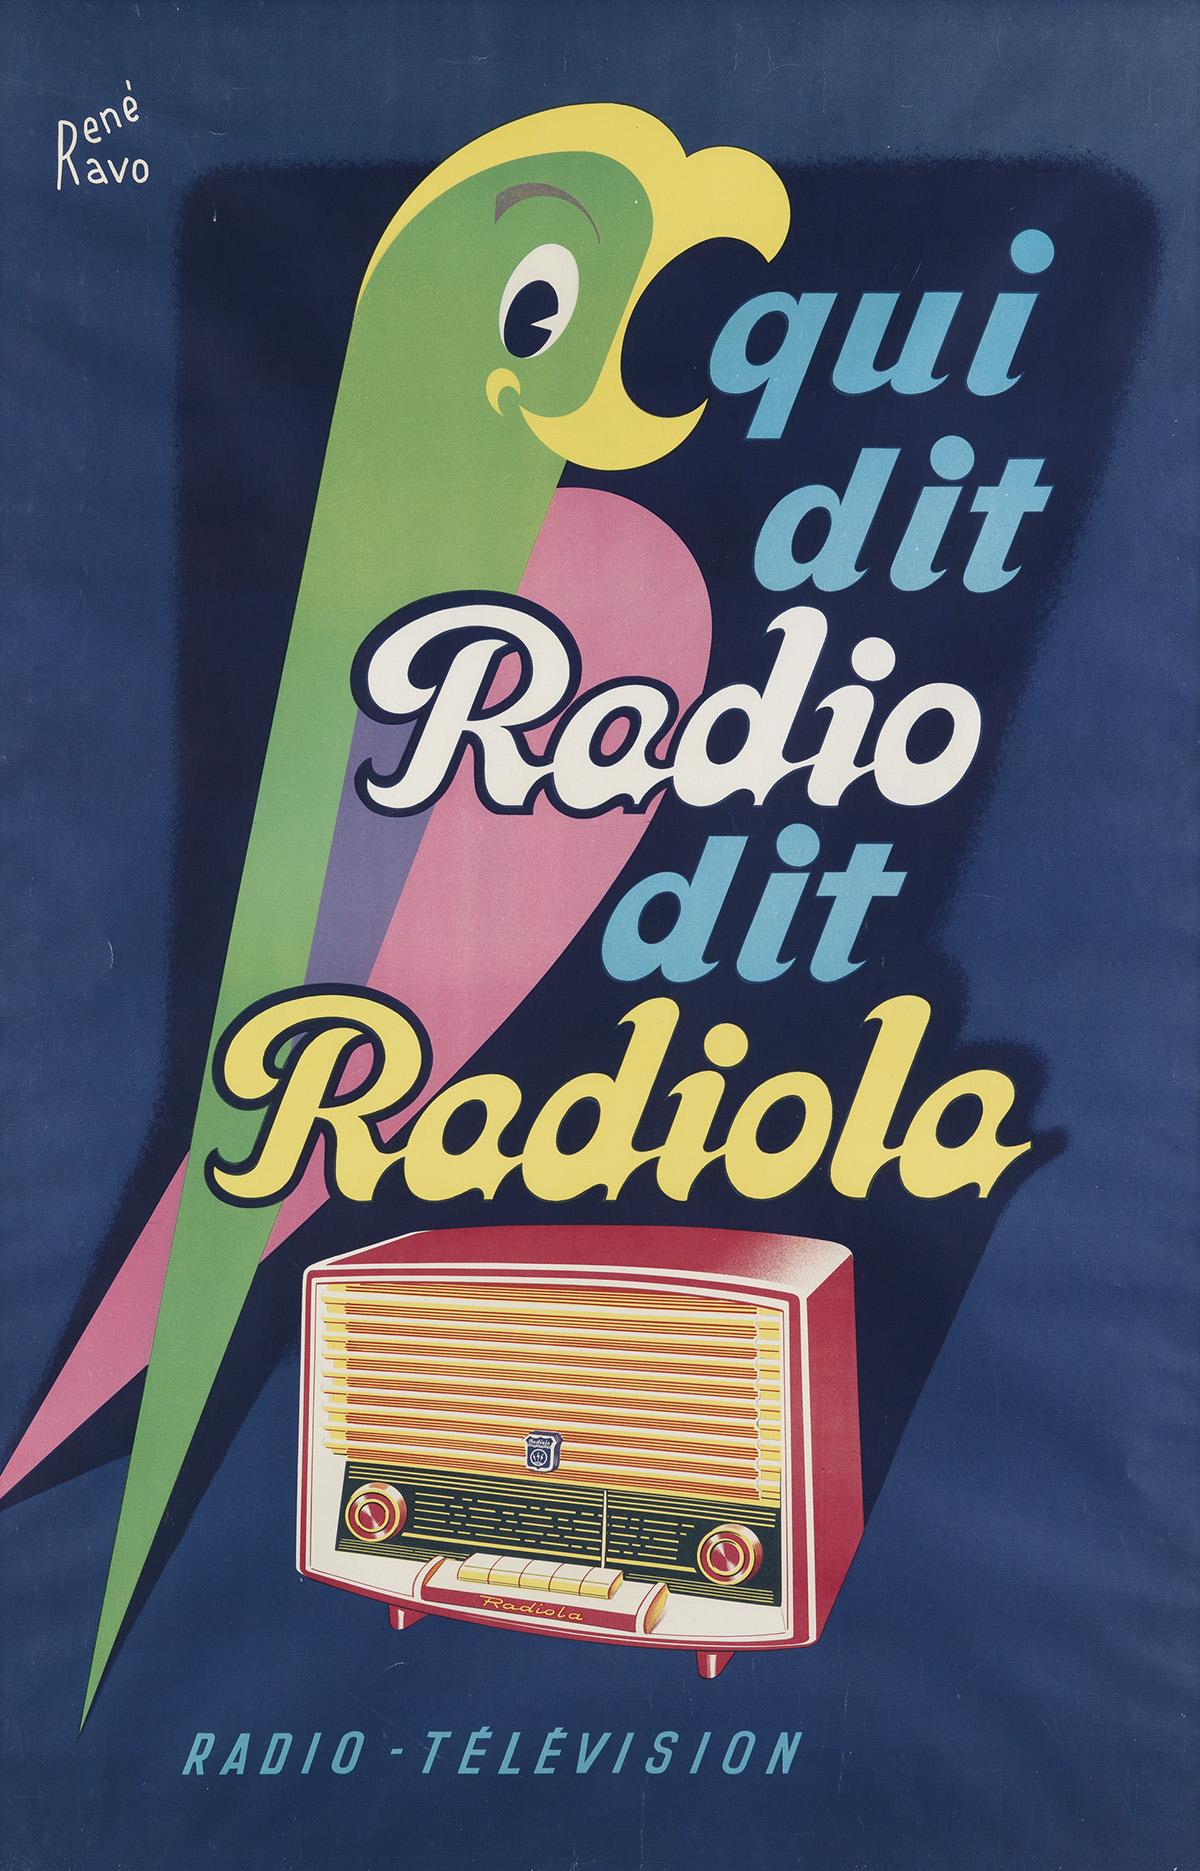 RENÉ-RAVO-(1904-1998)-QUI-DIT-RADIO-DIT-RADIOLA-Circa-1955-4